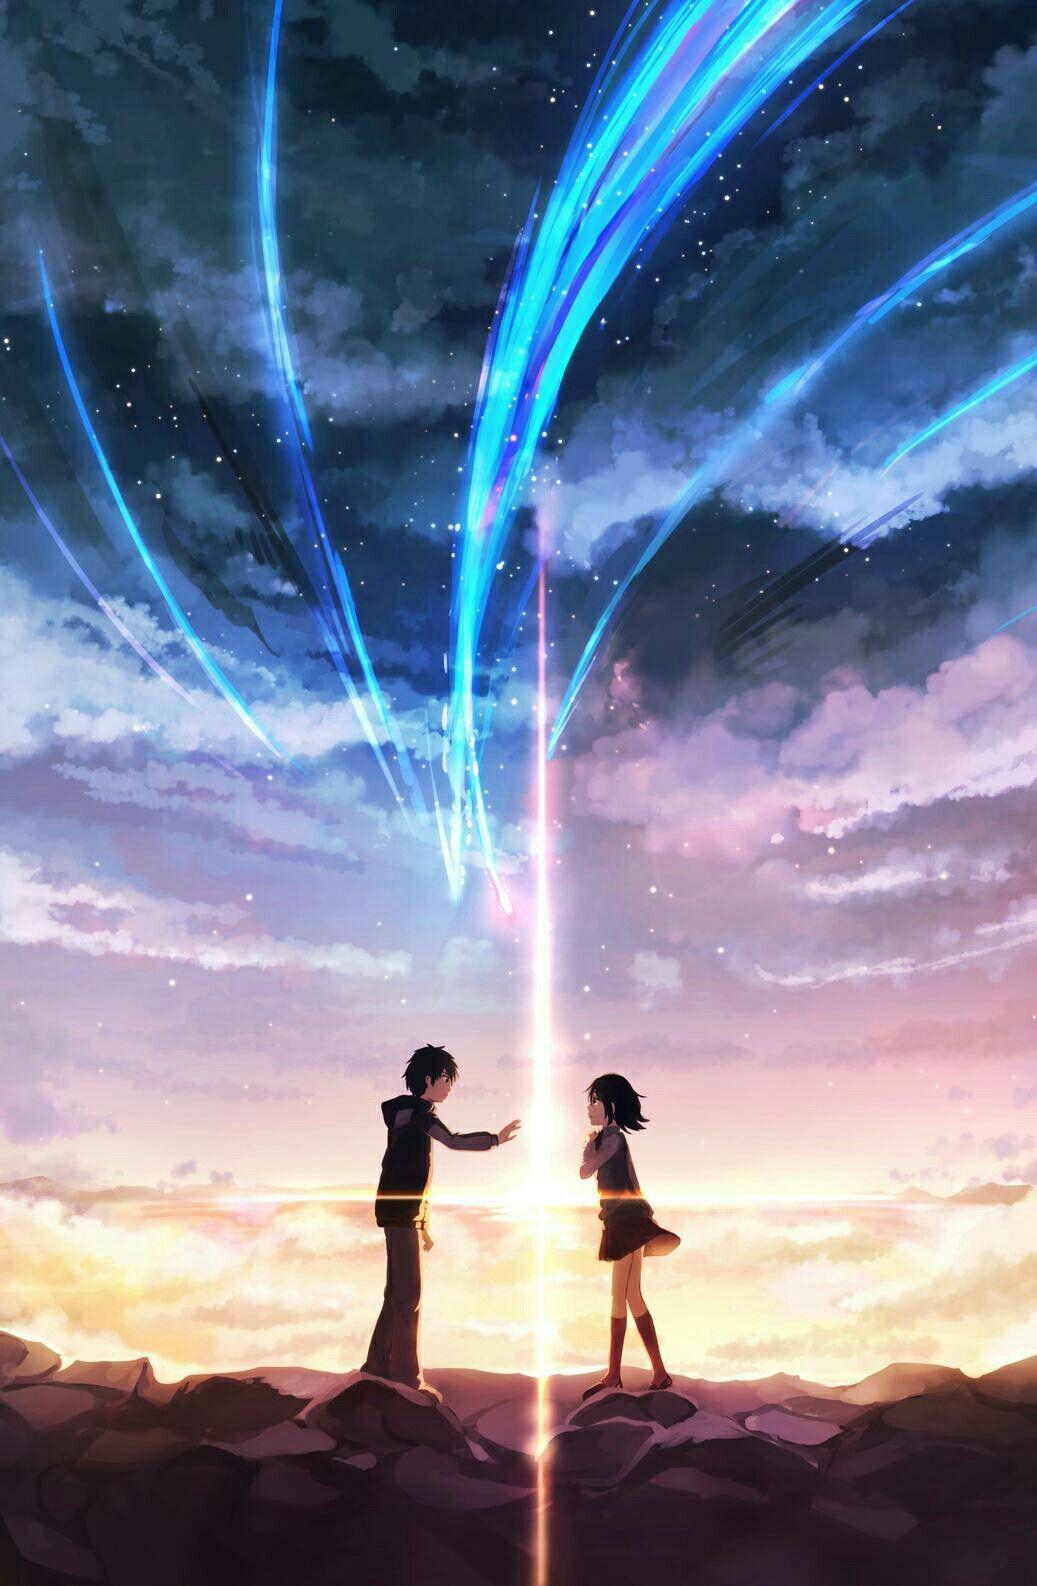 Kimi no nawa Pemandangan anime, Pemandangan, Pemandangan